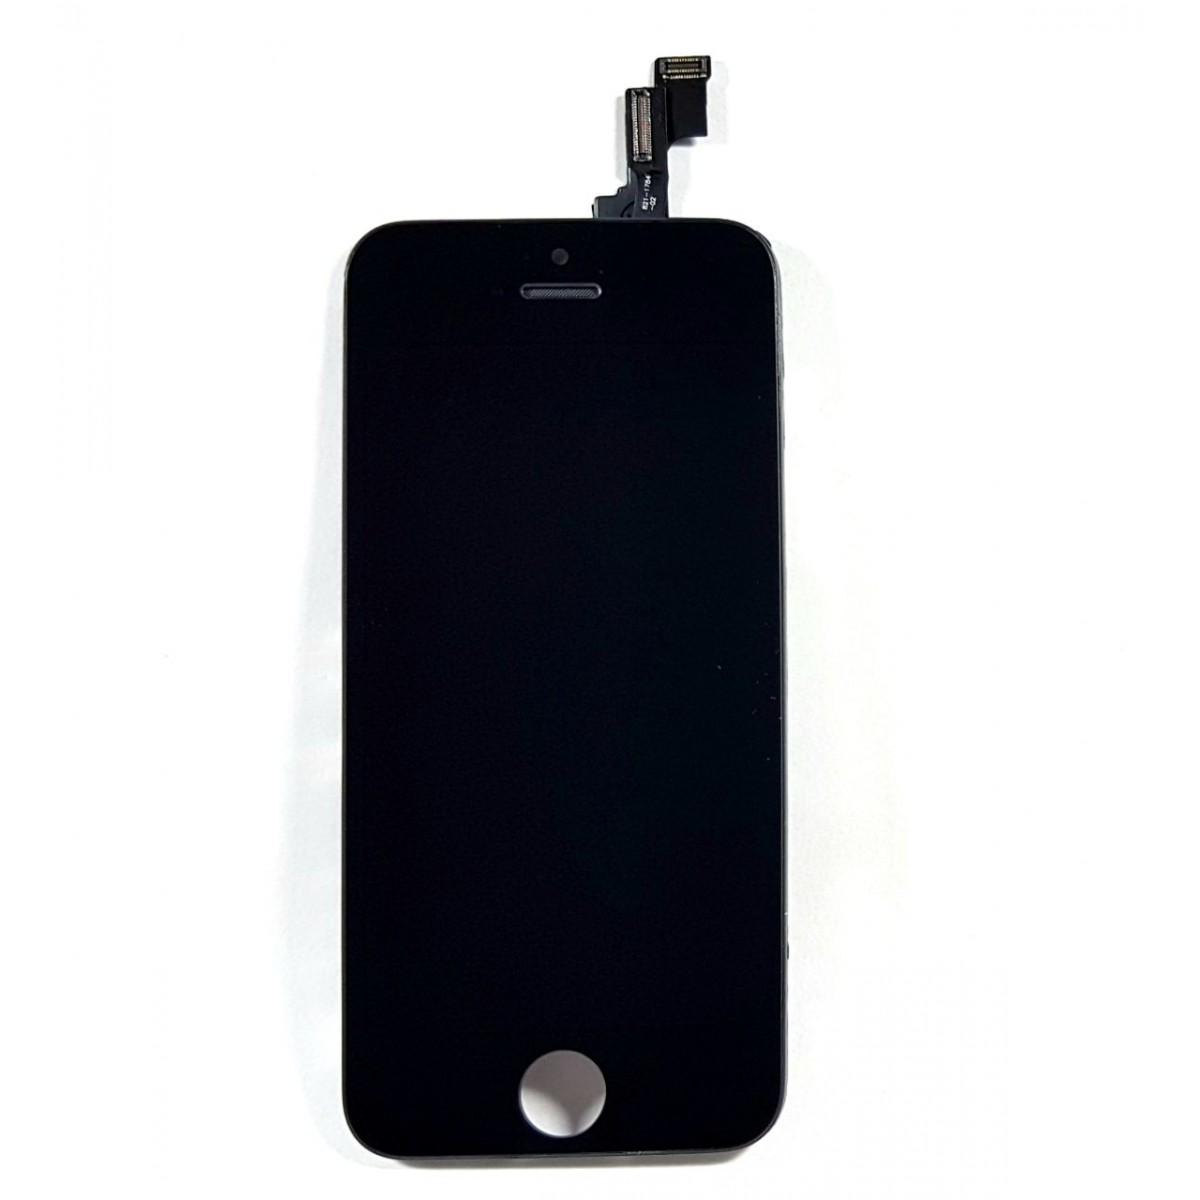 Frontal Apple Iphone 5s Original Preto